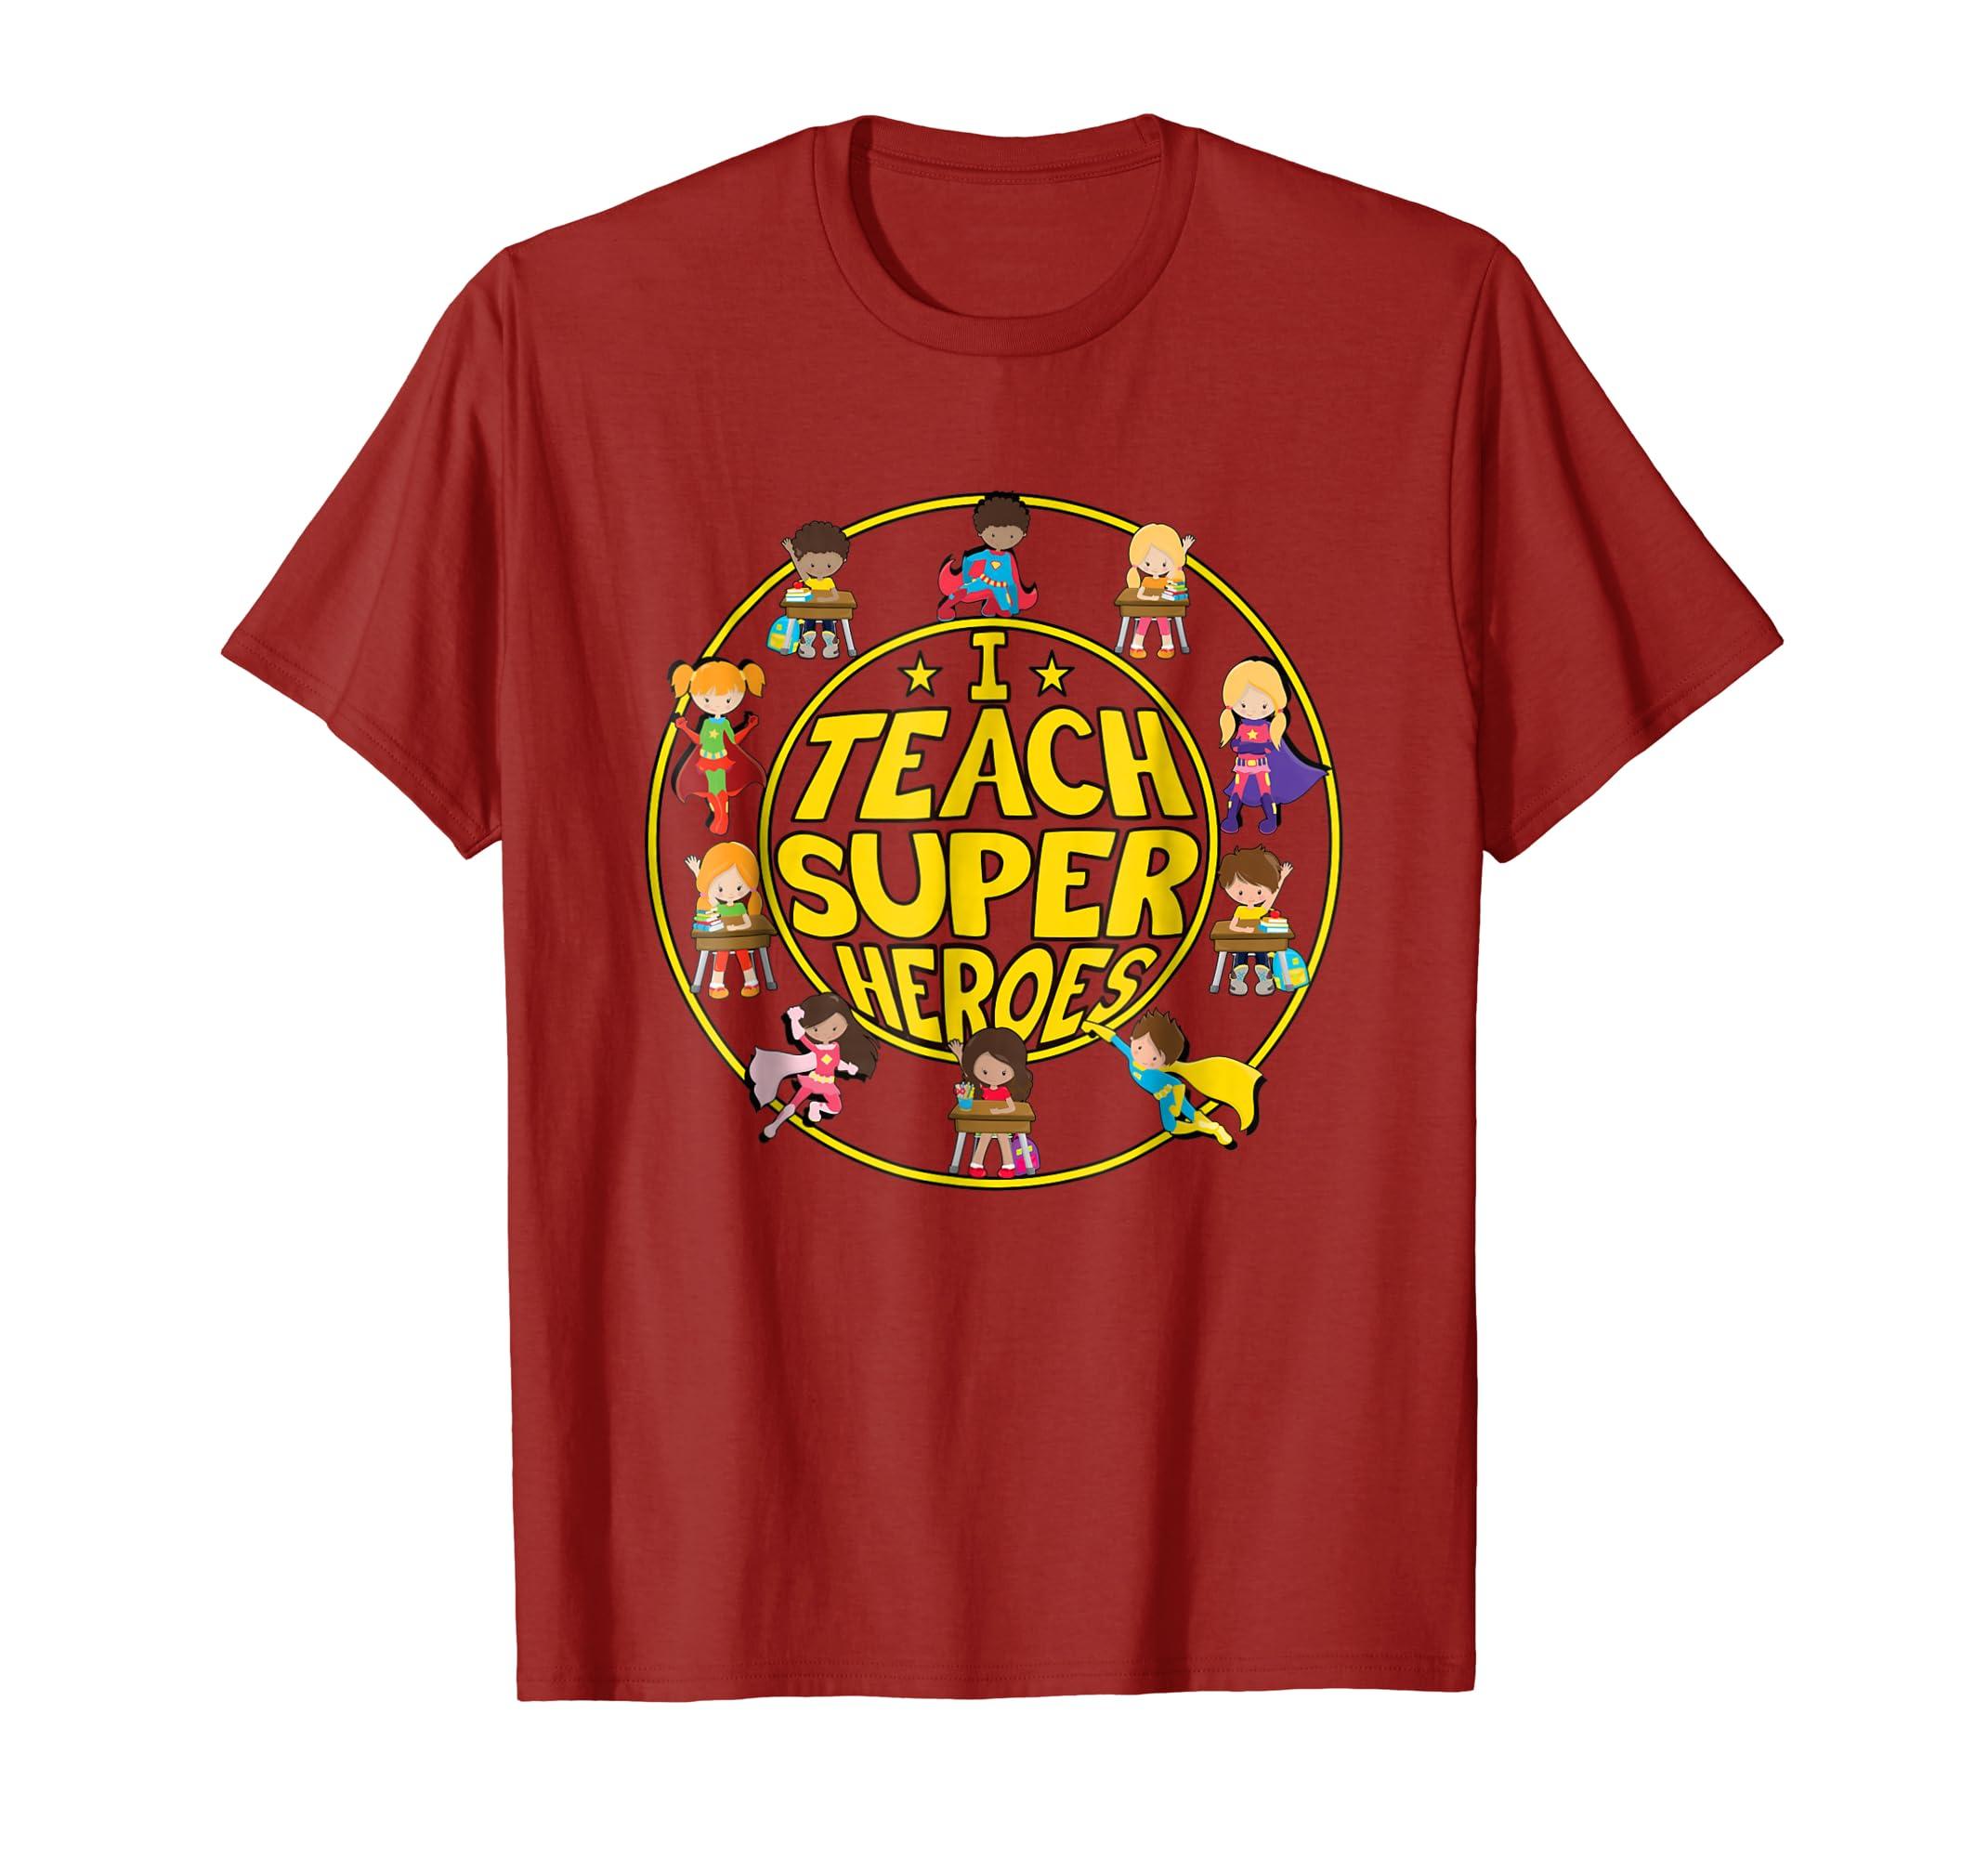 Superhero Teacher T-shirt – I Teach Super Heroes-Yolotee